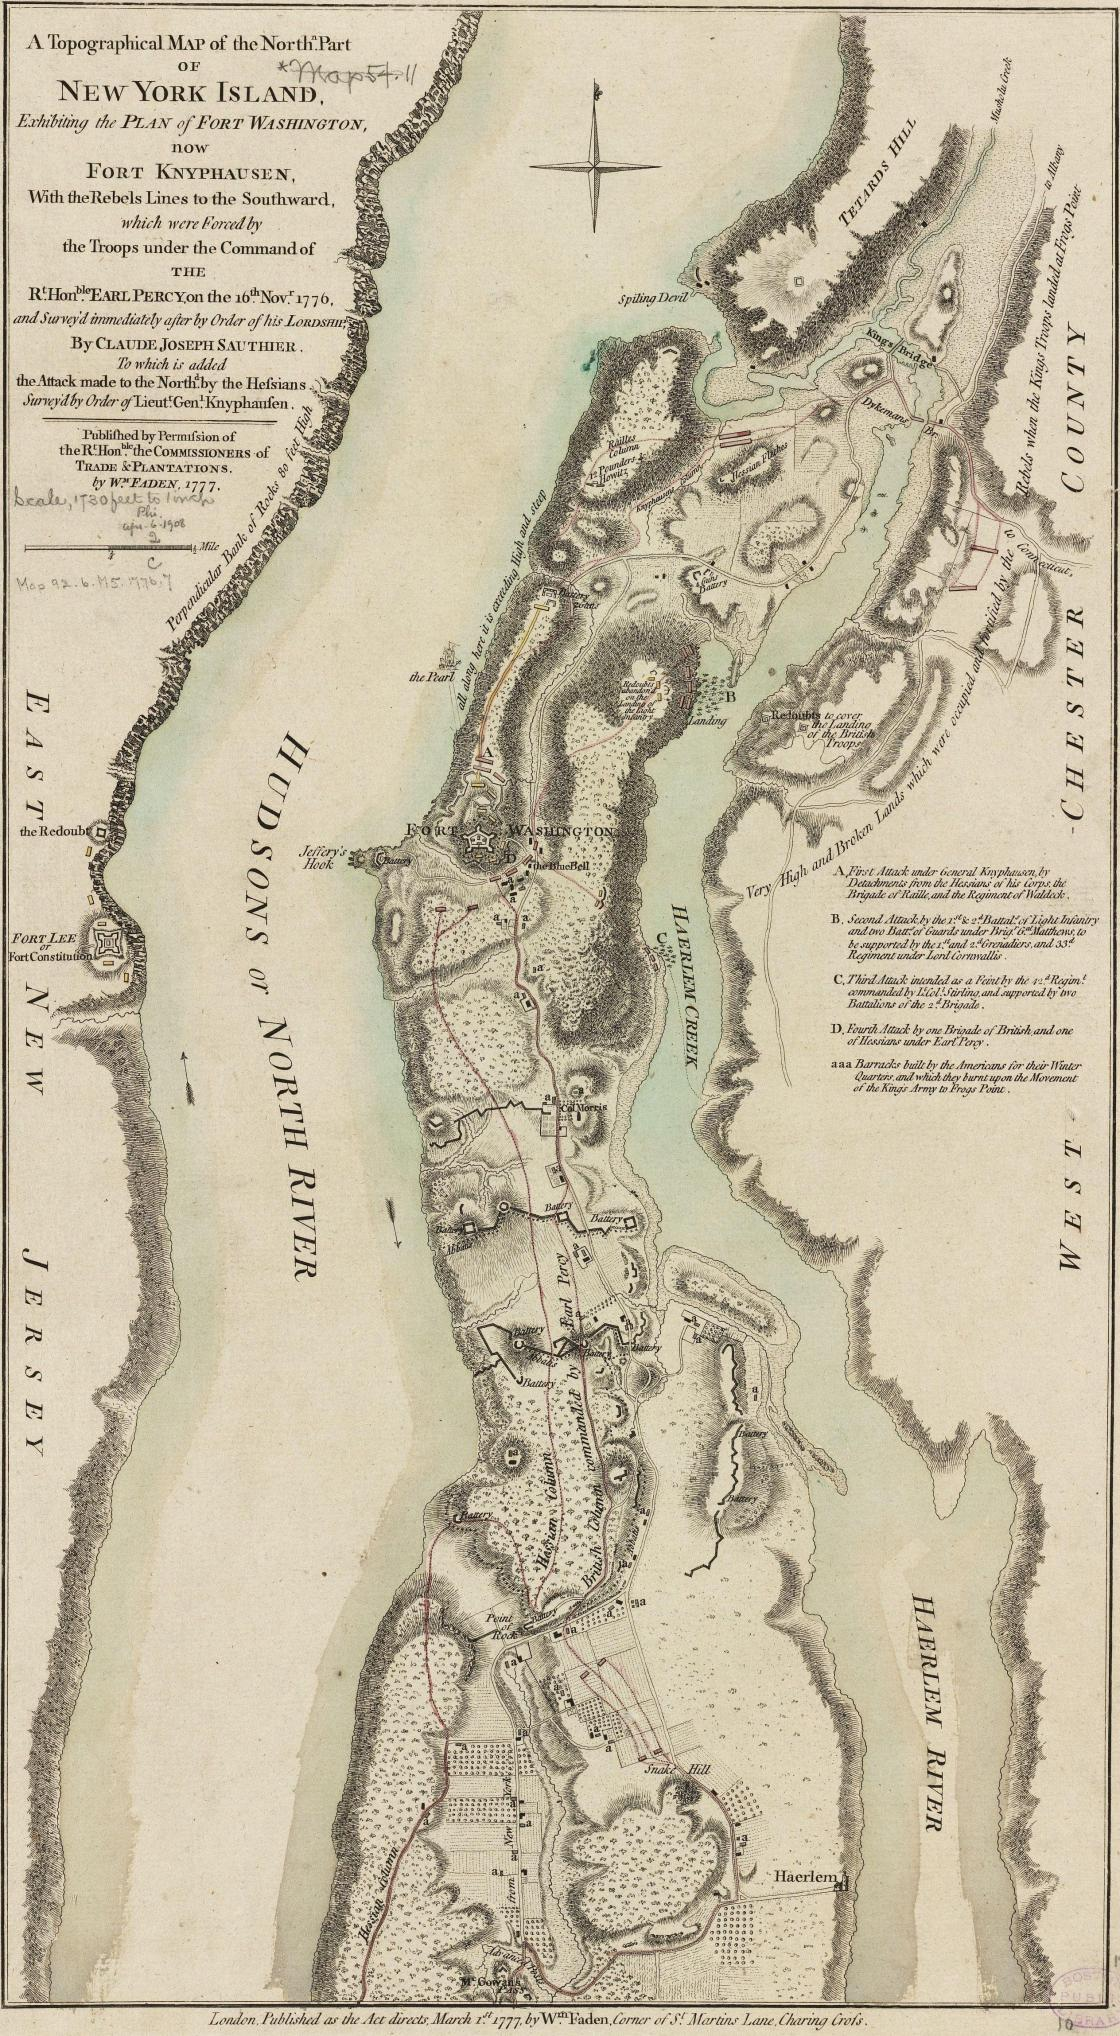 Fort Washington Map.Fort Washington November 16 1776 American Battlefield Trust